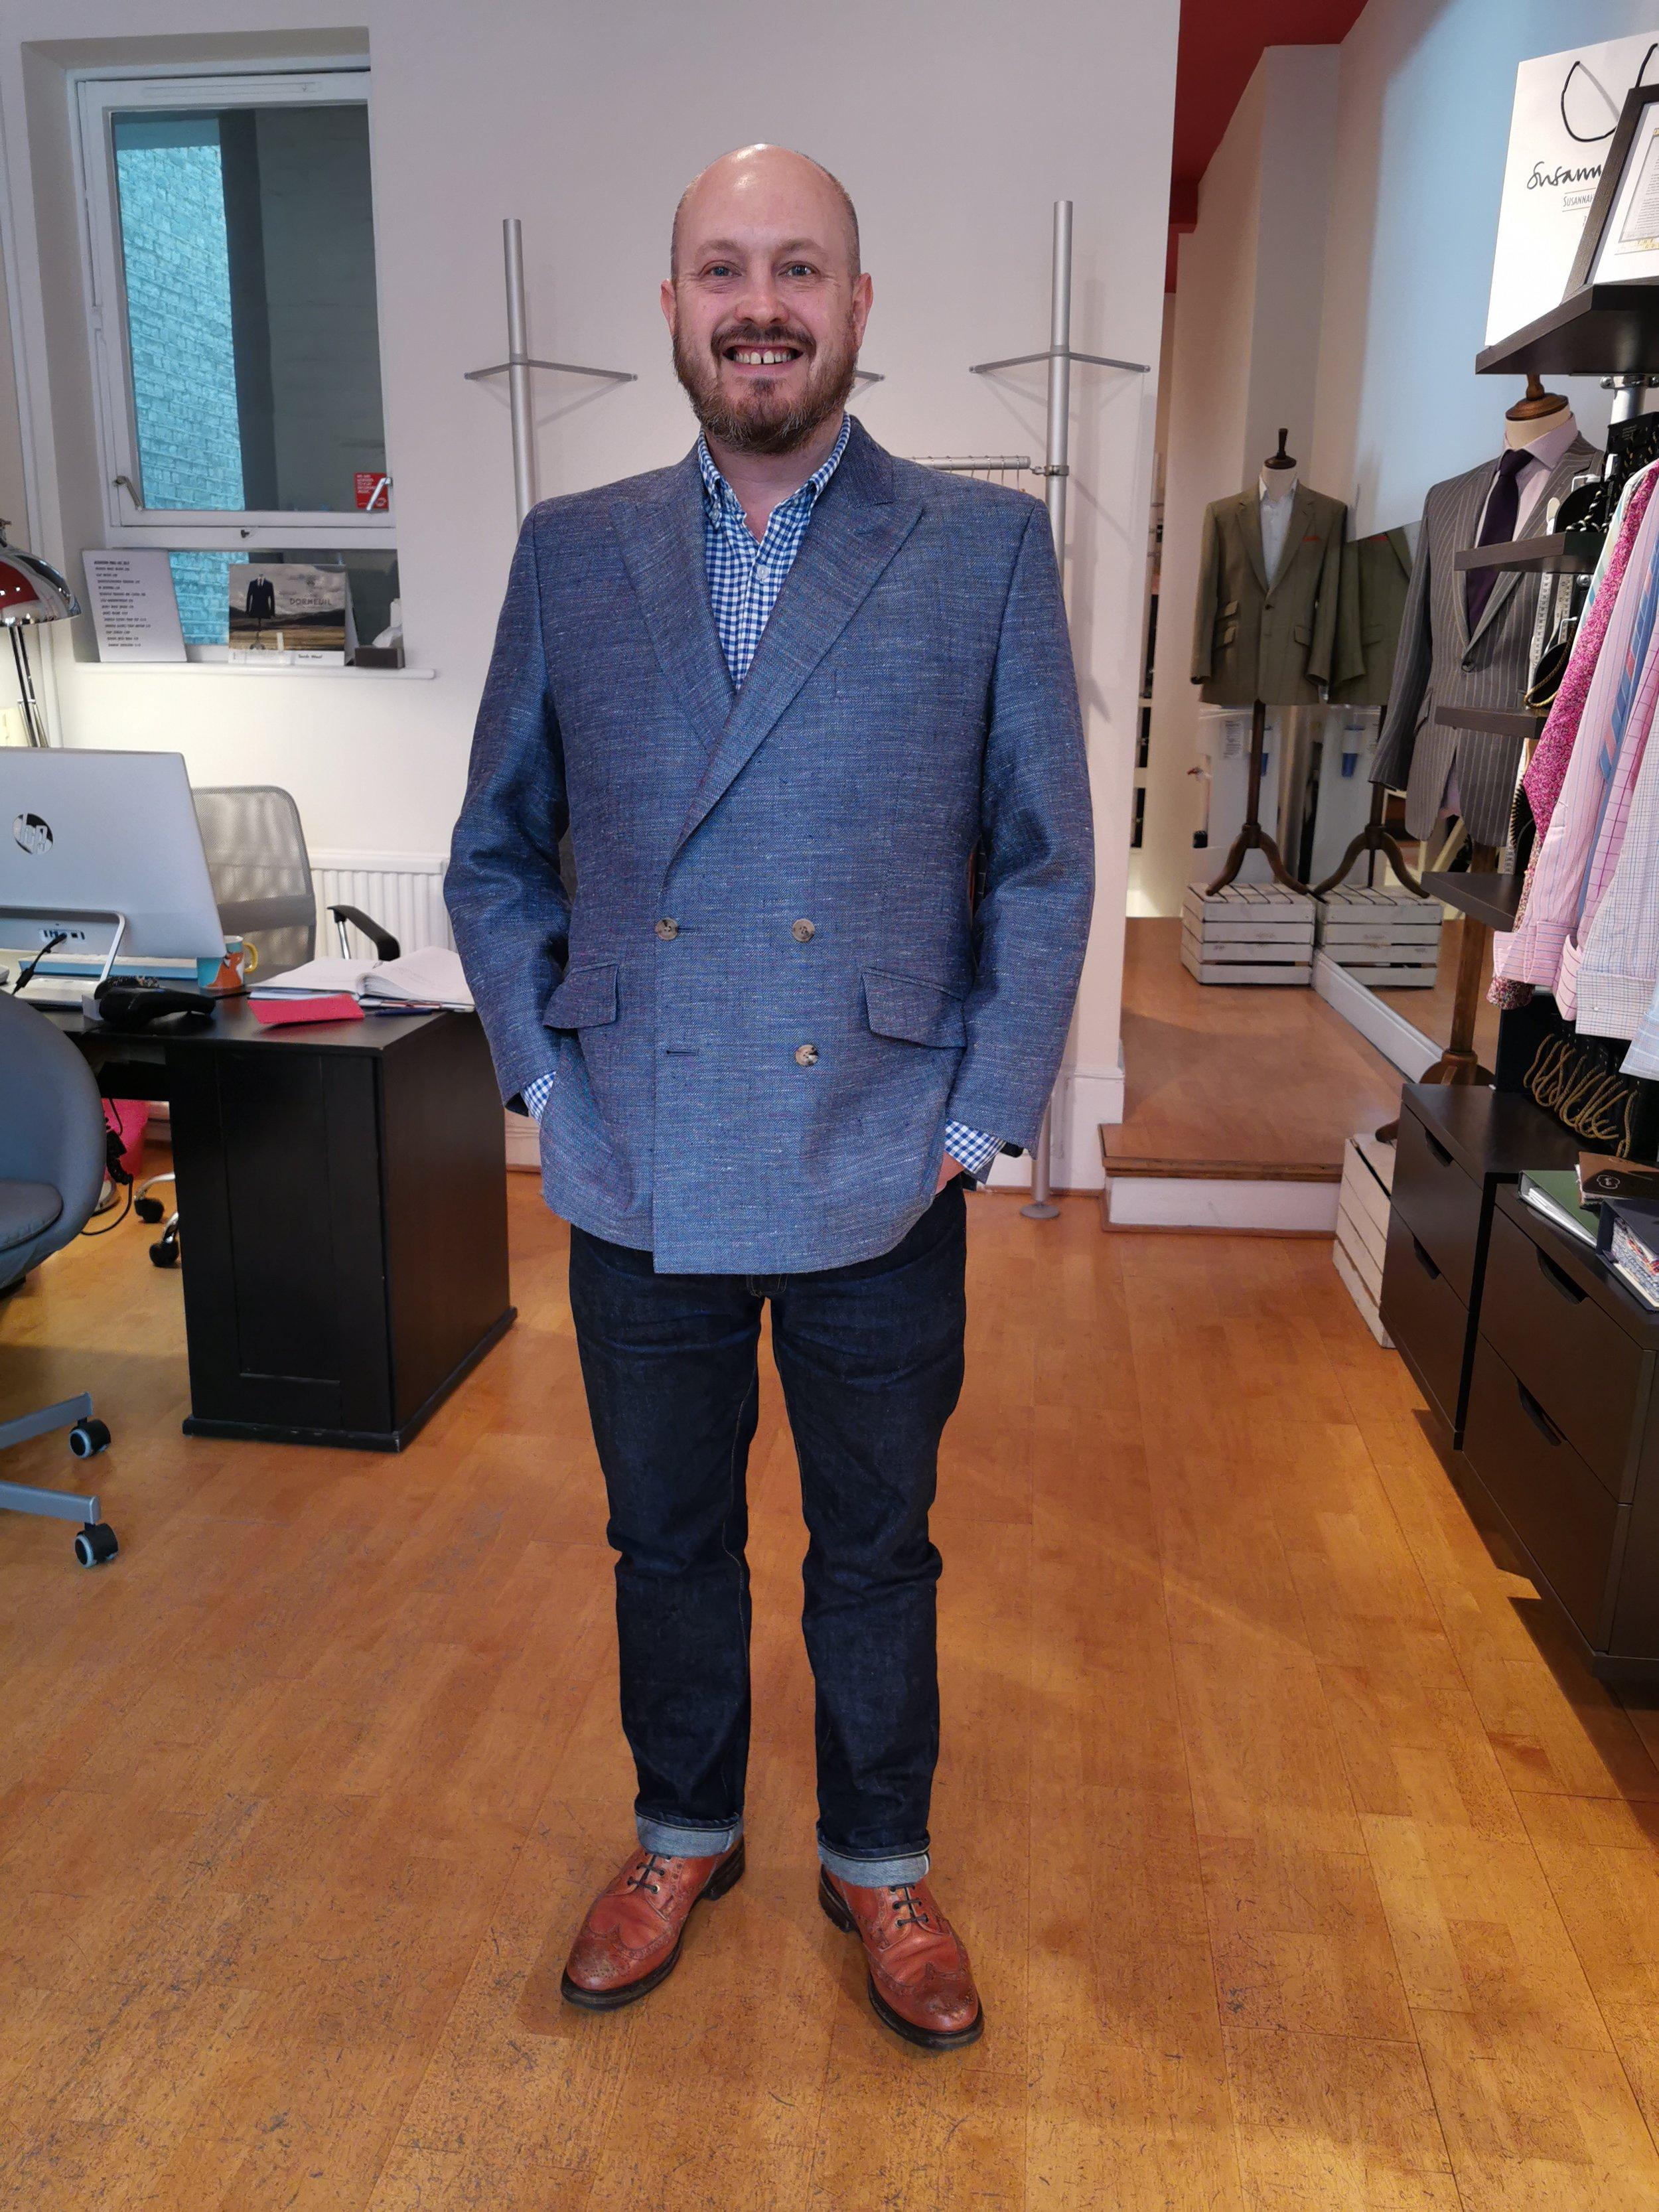 susannah-hall-bespoke-tailor-jacket-linen-silk-double-breasted-horn-buttons-herringbone-made-uk-britain.jpg